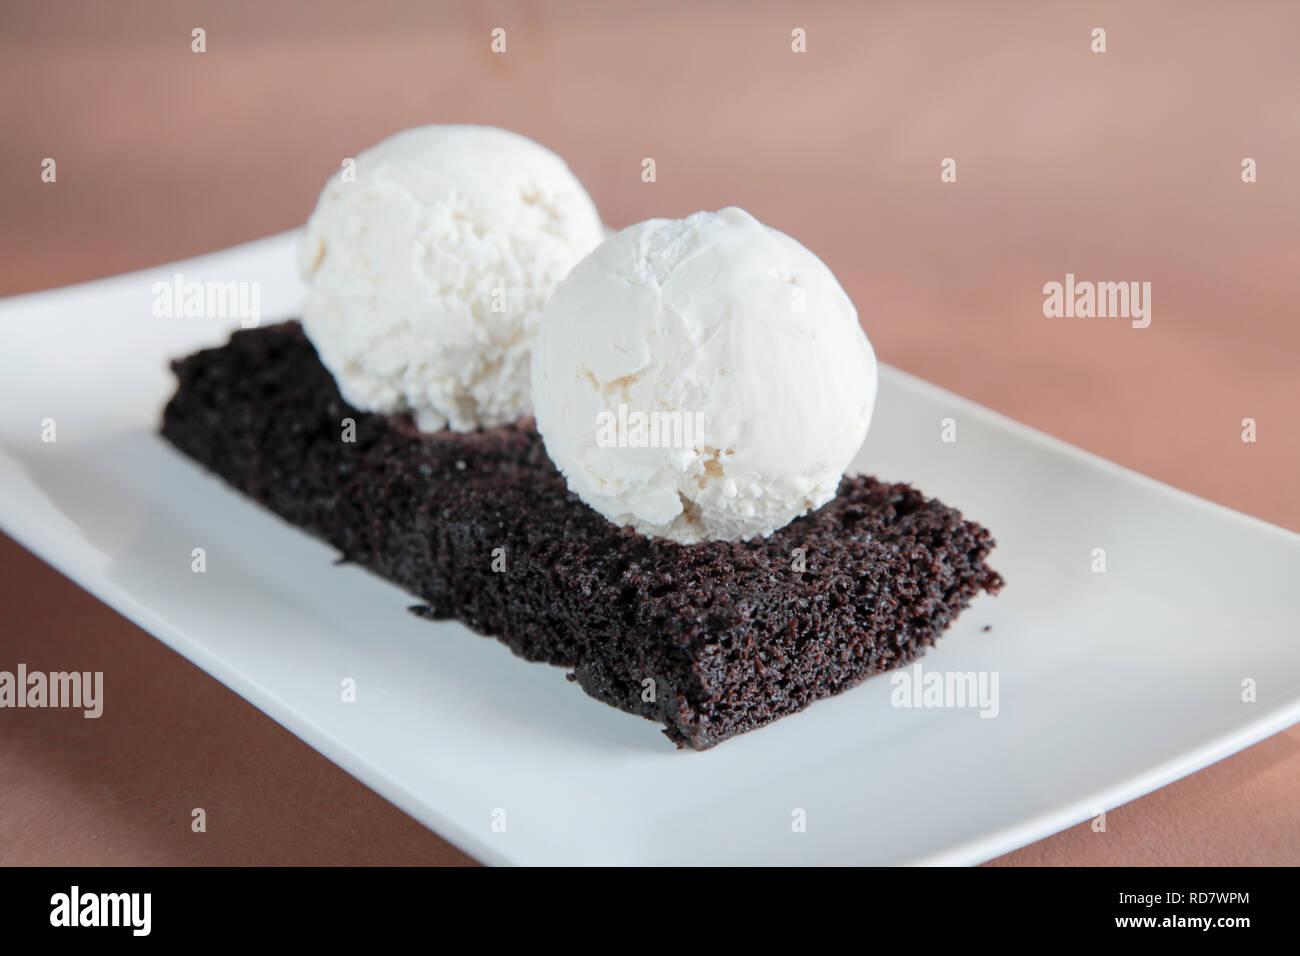 Chocolate Brownie with Vanilla Ice Cream Stock Photo